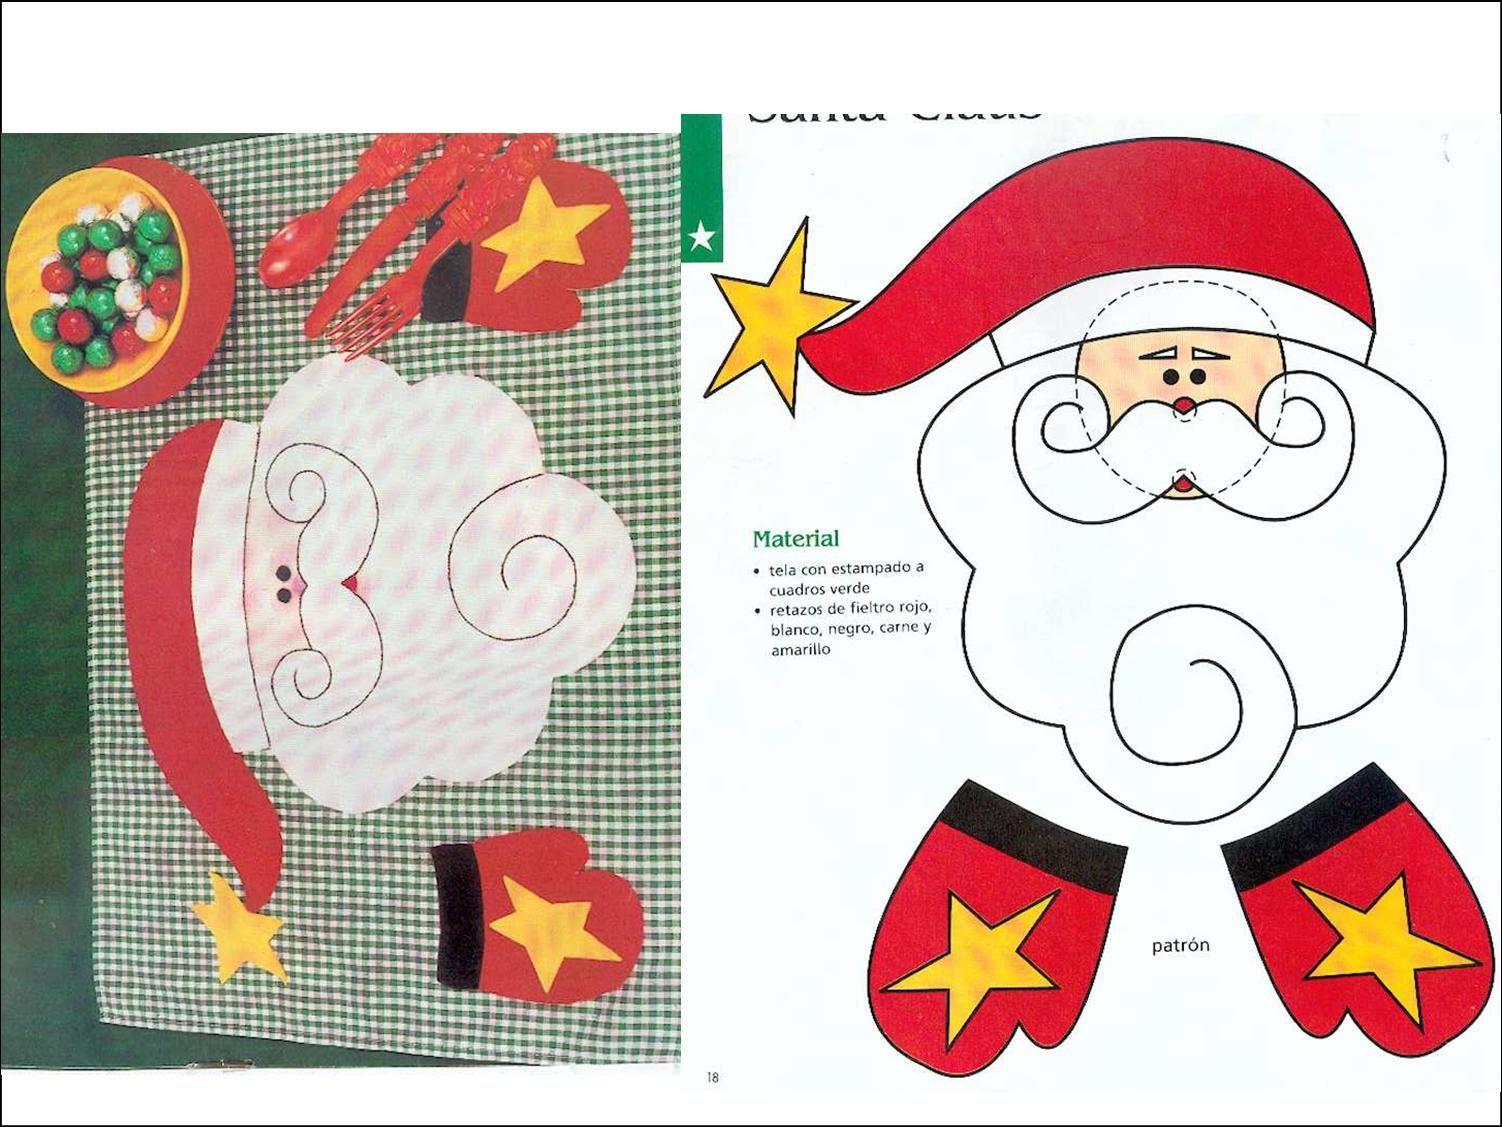 Manualidades navidad goma eva m goma eva jogo - Manualidades navidad goma eva ...